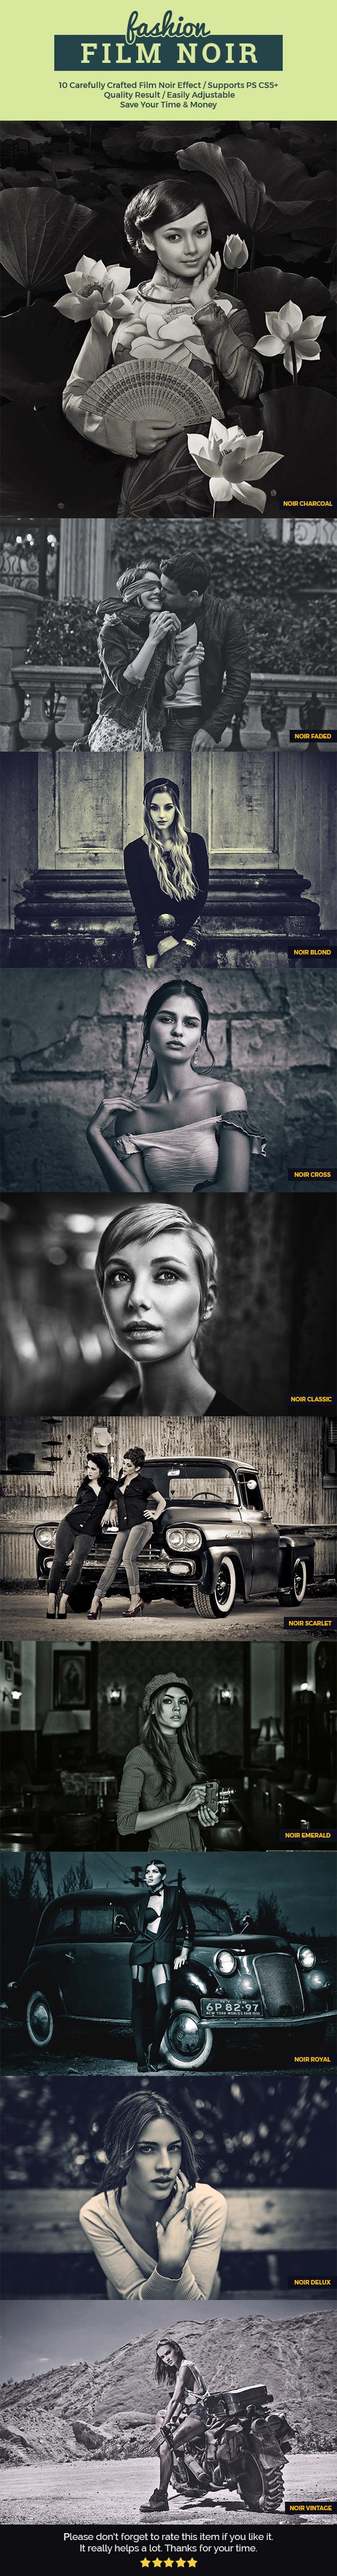 Film Noir - Photo Effects Actions